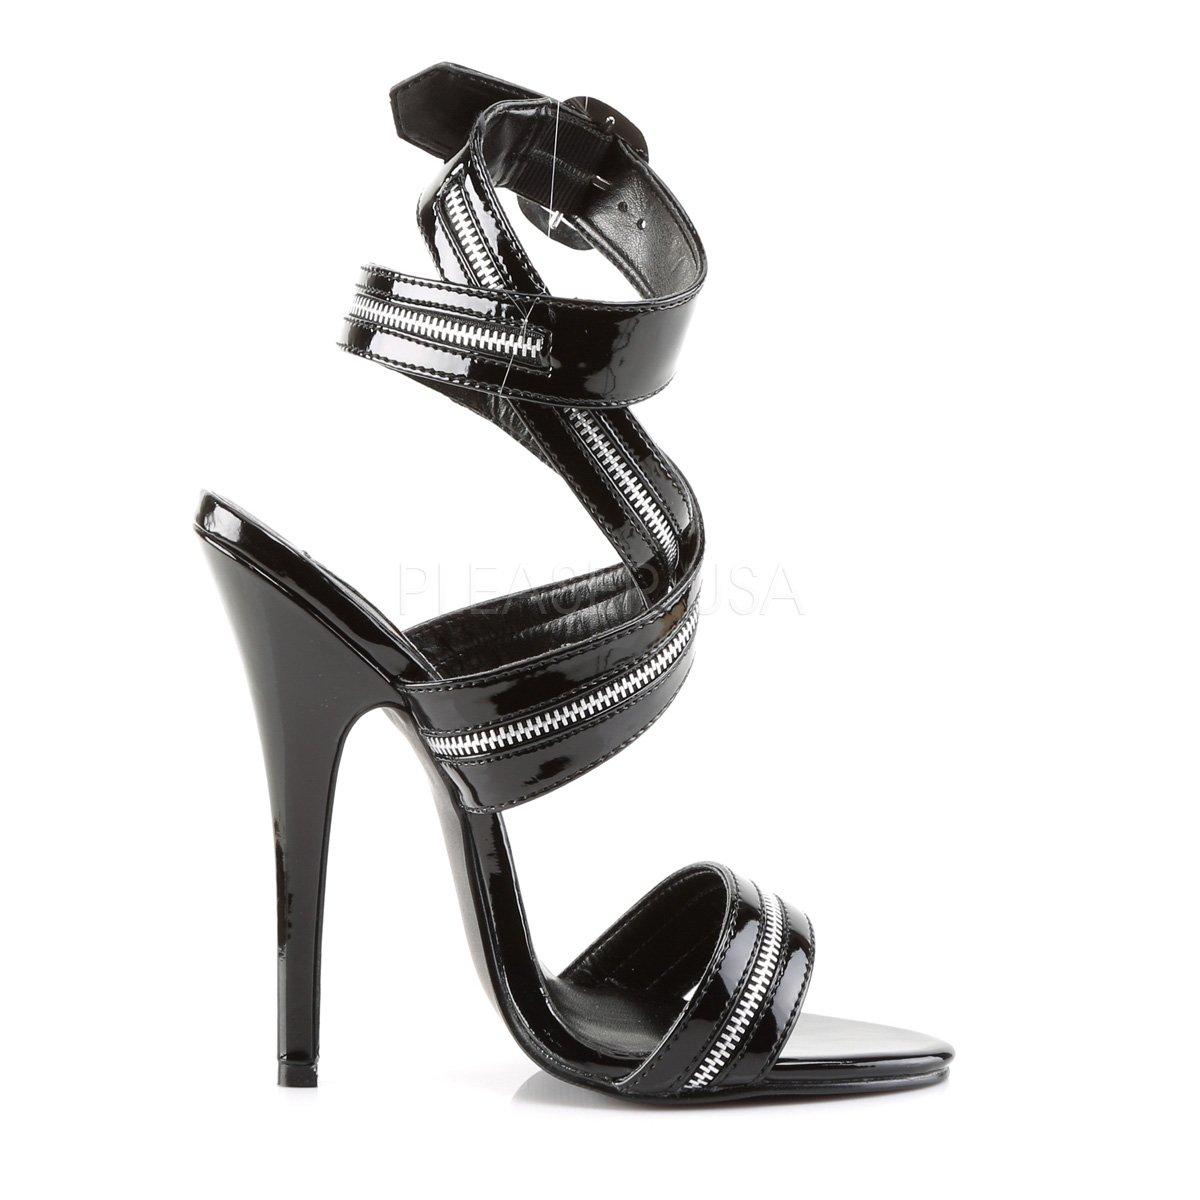 584819359c7648 Higher-Heels PleaserUSA Sandaletten Domina-119  Amazon.de  Schuhe    Handtaschen